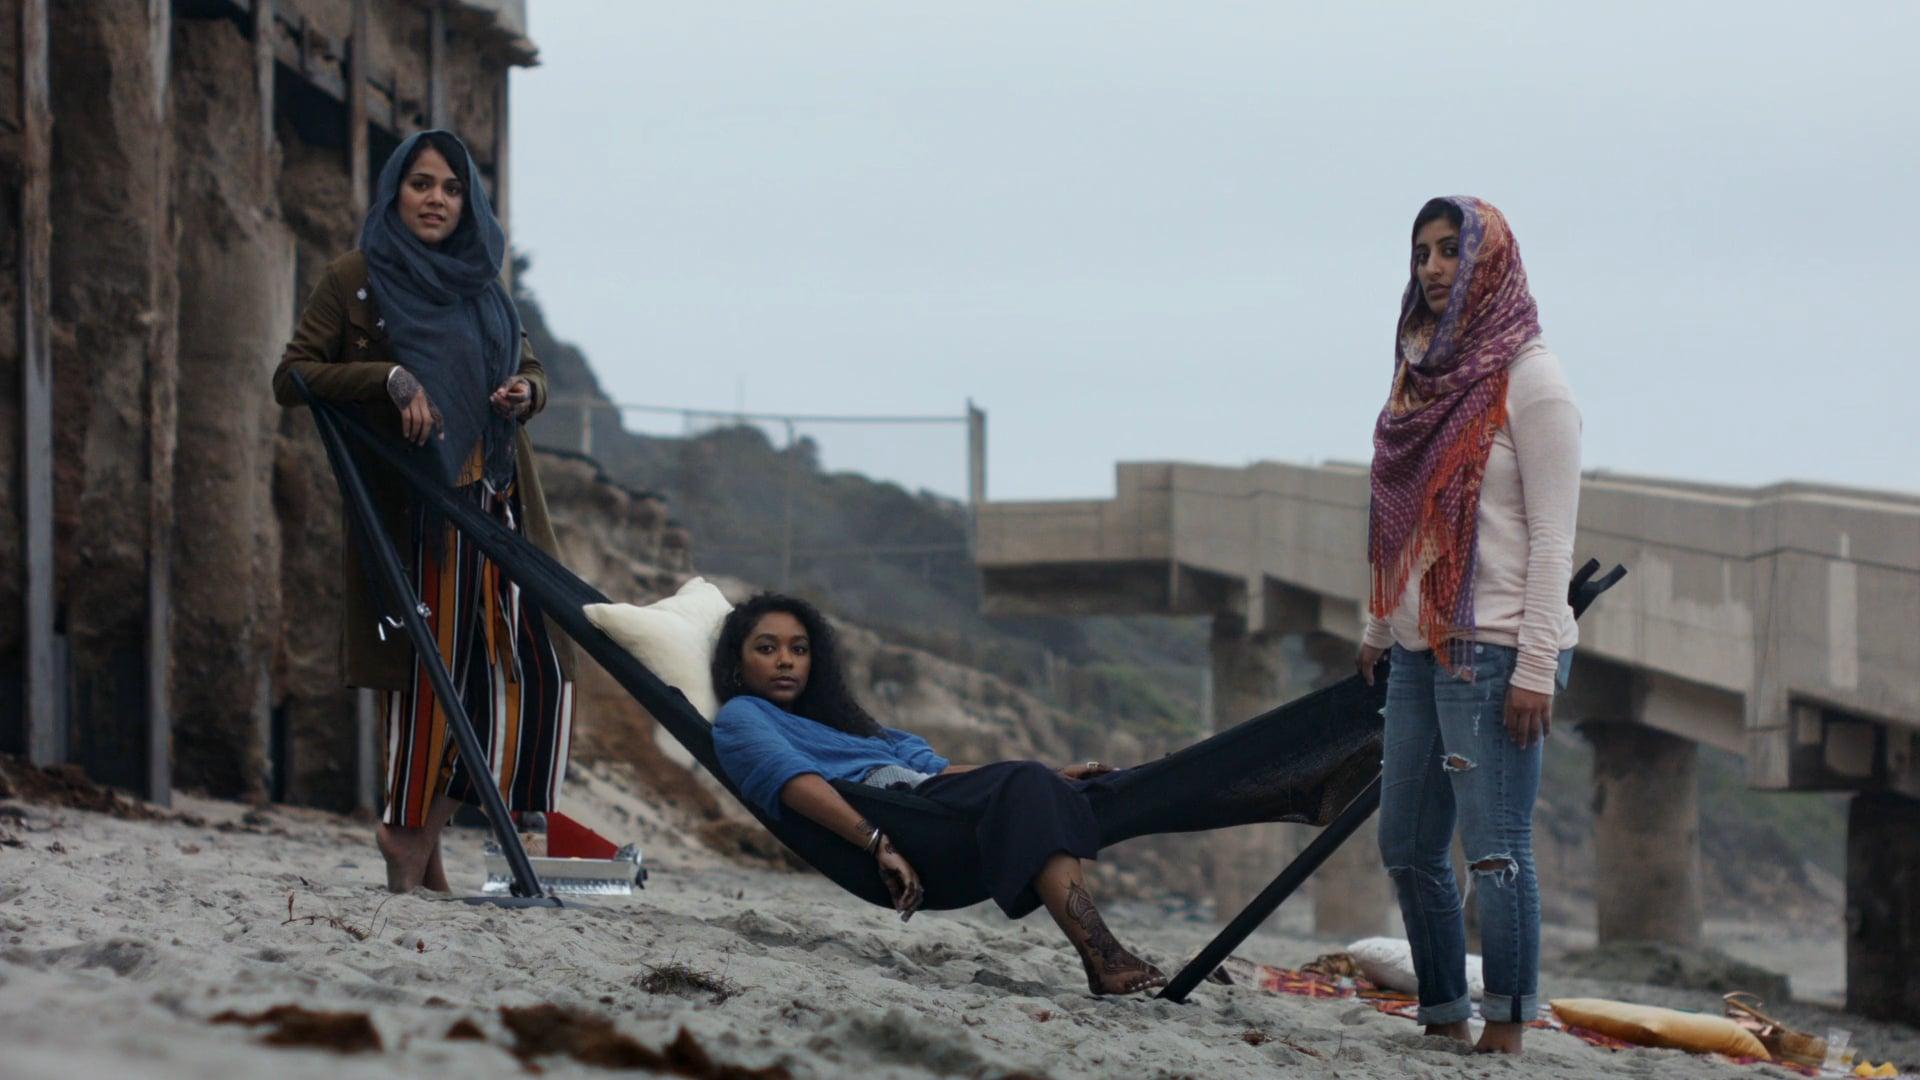 application for the position of abdelhalim hafez's girl   Poem by Safia Elhillo   Film by Donna Lamar